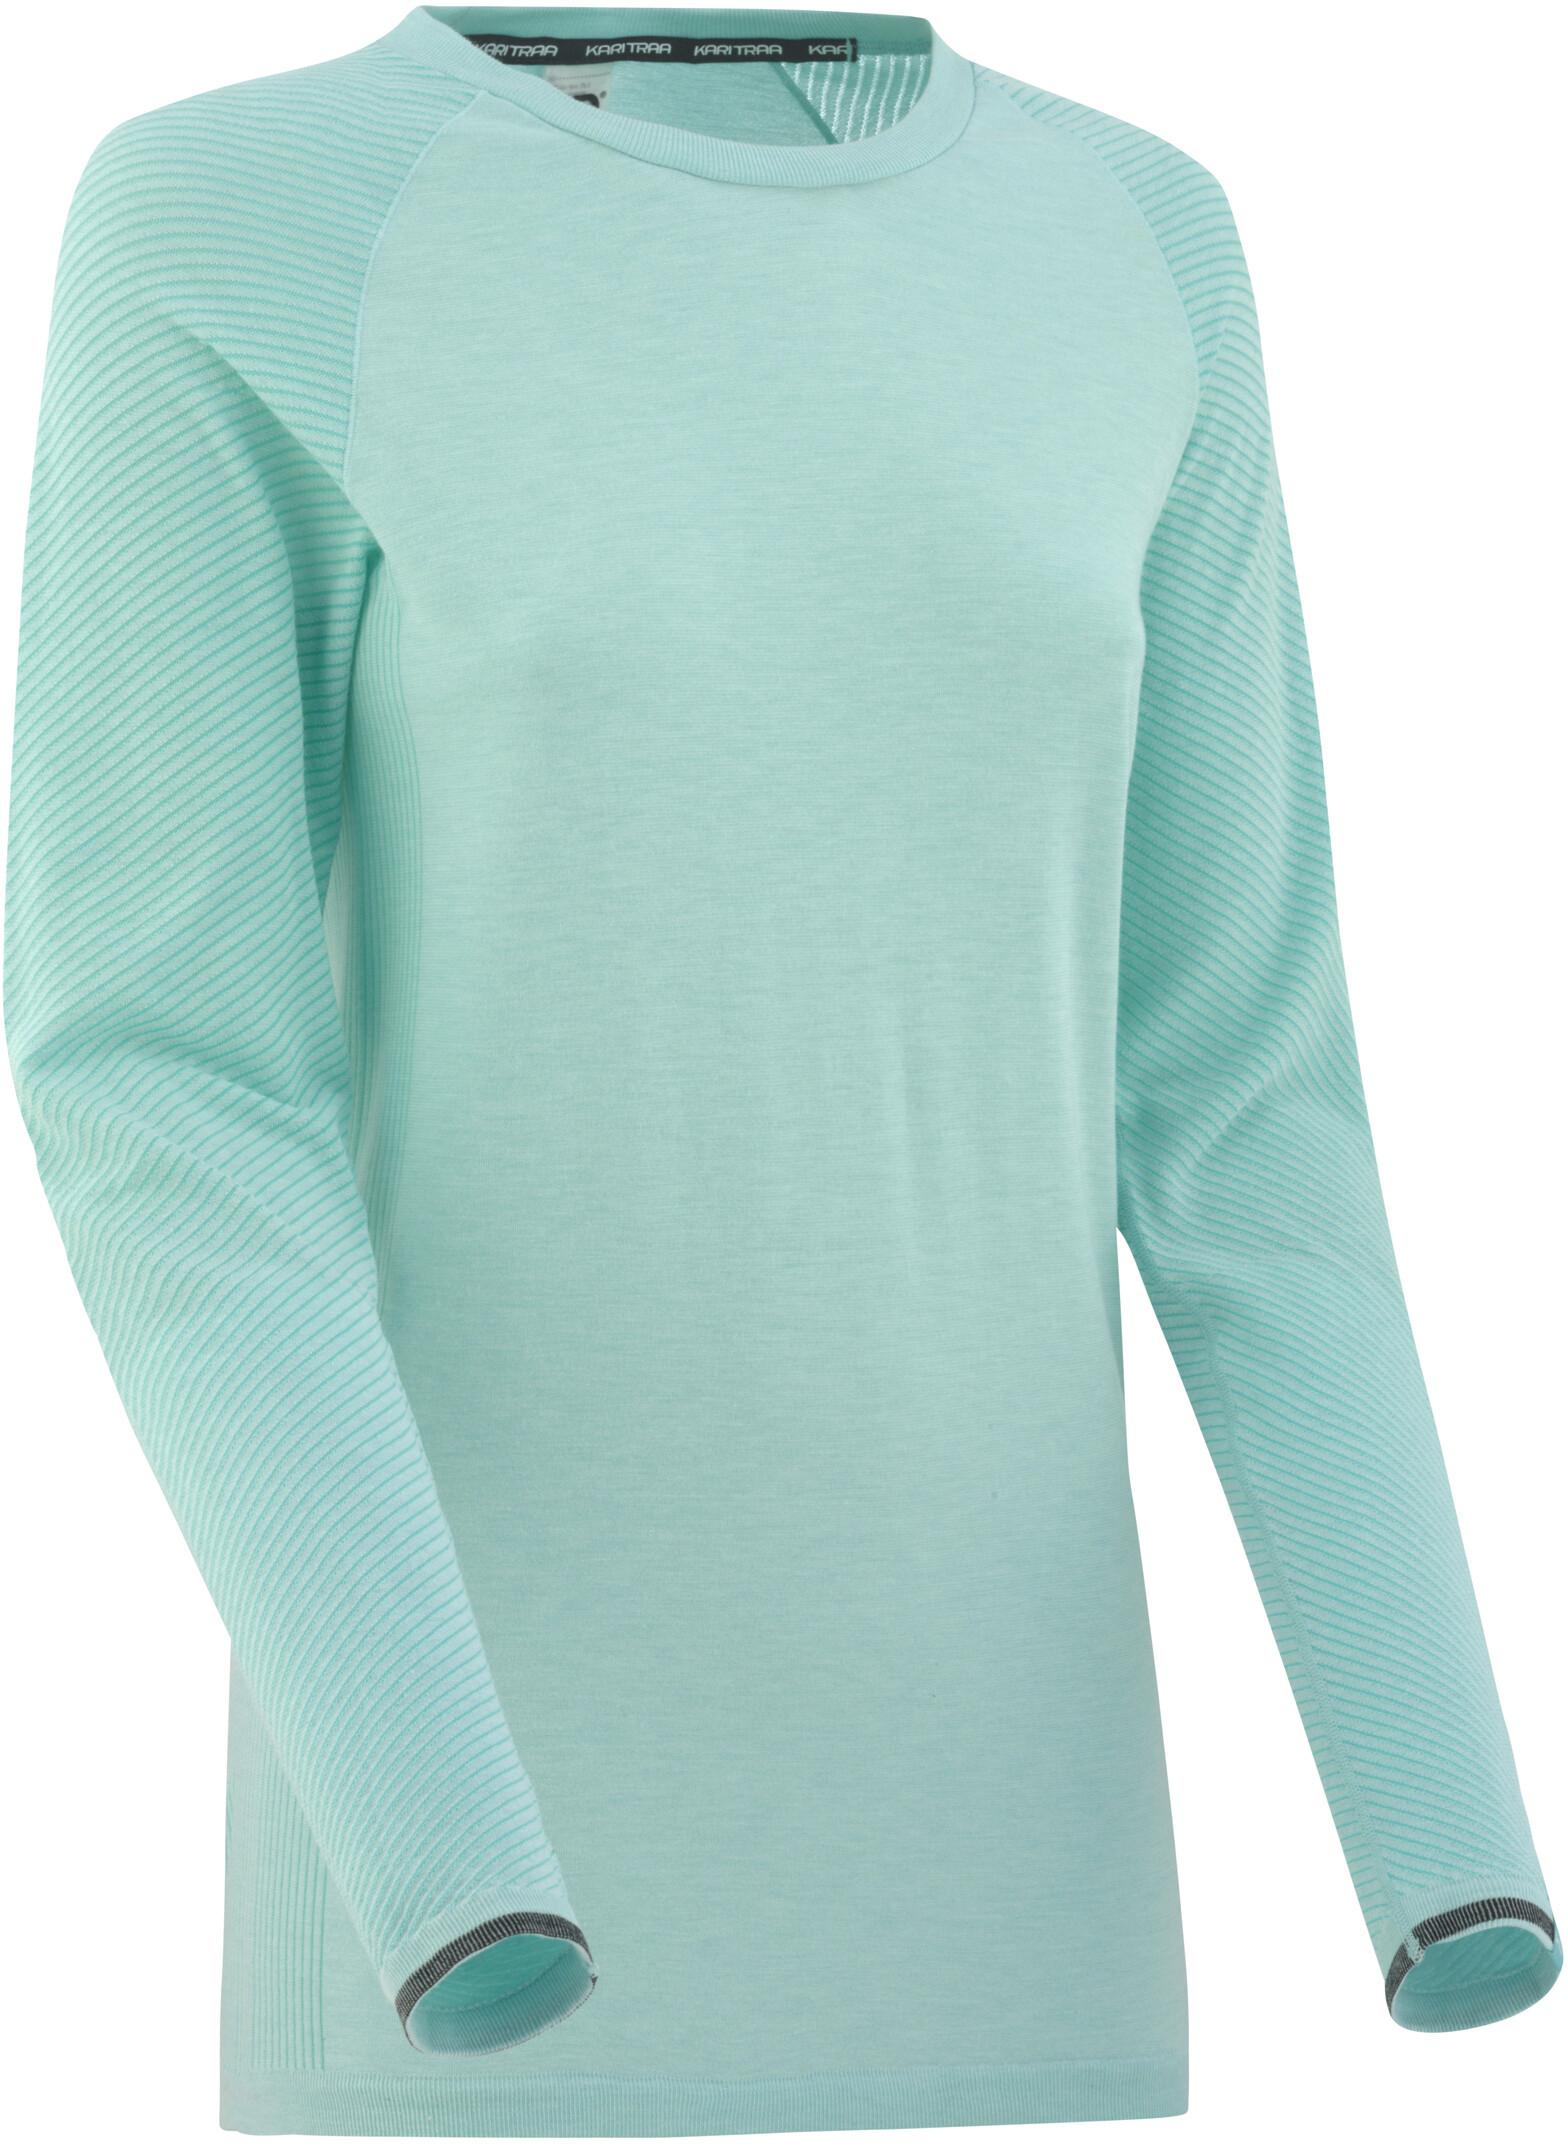 f30ca34fb7f Kari Traa Eva - T-shirt manches longues Femme - turquoise sur CAMPZ !